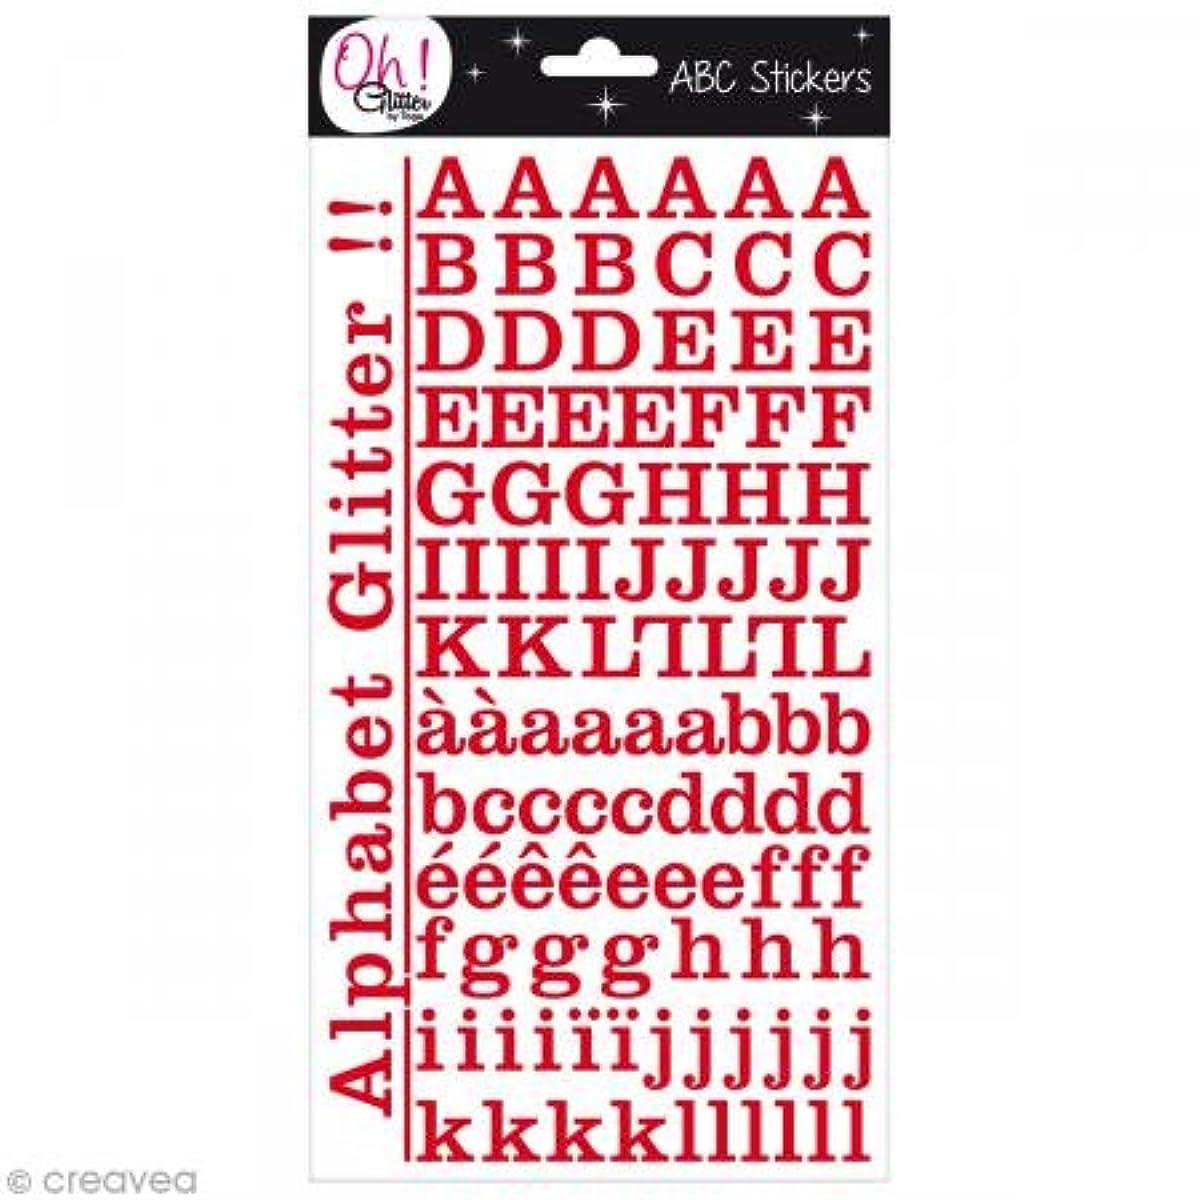 Oh ! Glitter Alphabet Stickers, Paper, Red, 14.5?x 29.5?x 0.2?cm